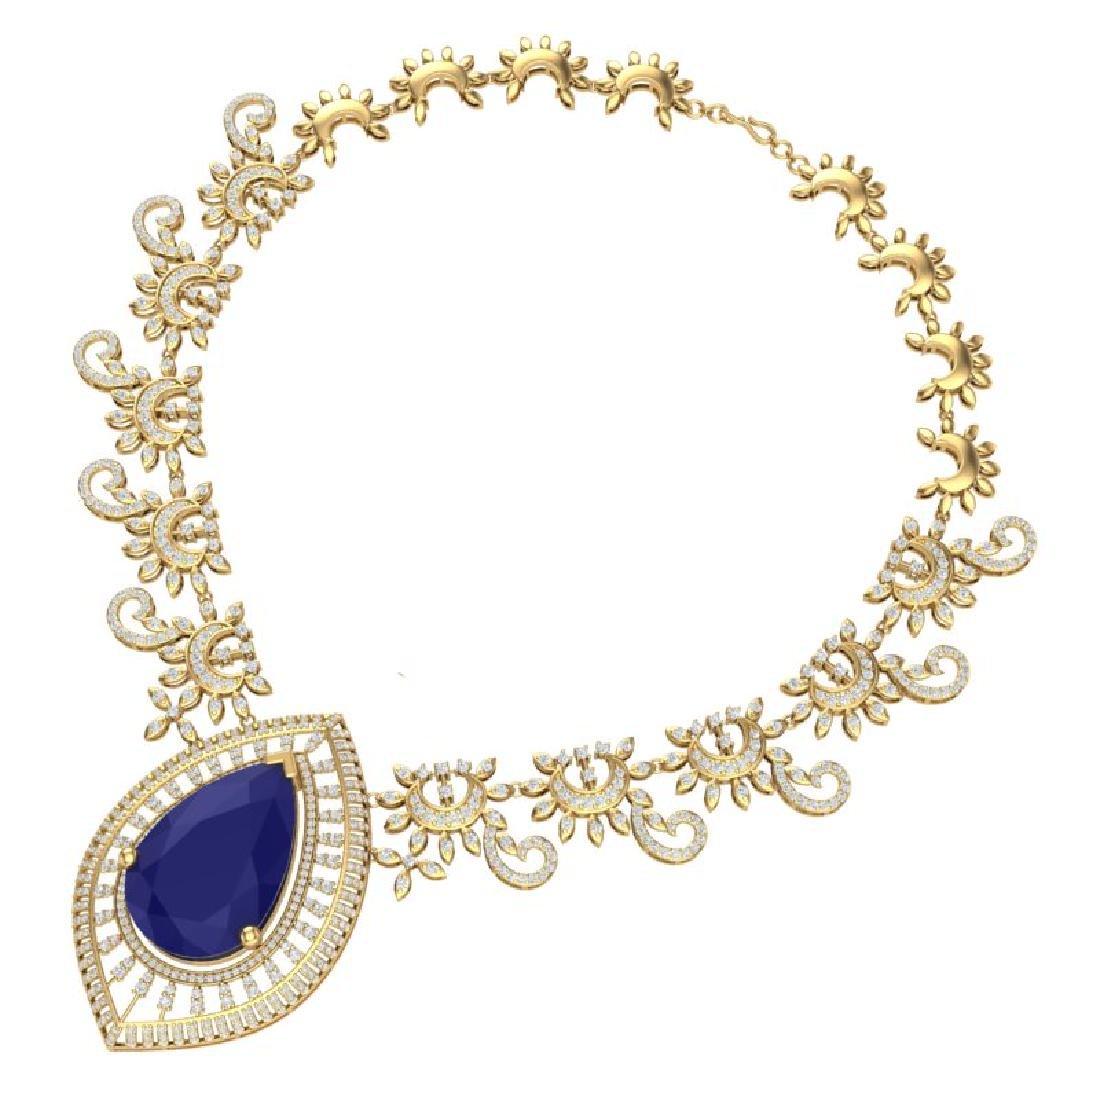 65.75 CTW Royalty Sapphire & VS Diamond Necklace 18K - 3